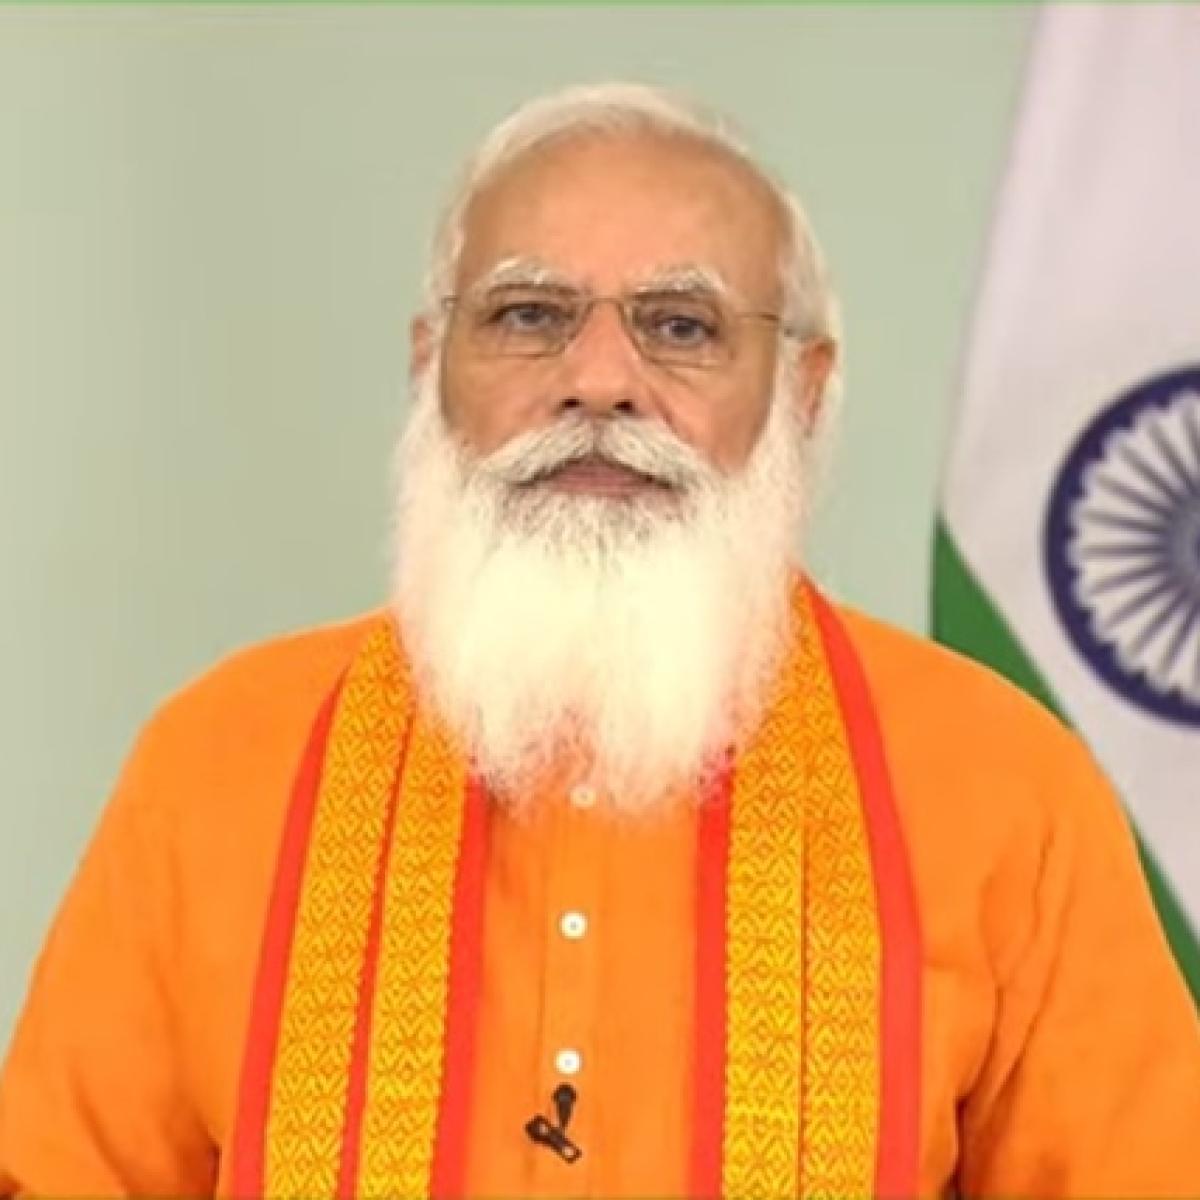 Yoga has become a ray of hope amid COVID-19, says PM Modi